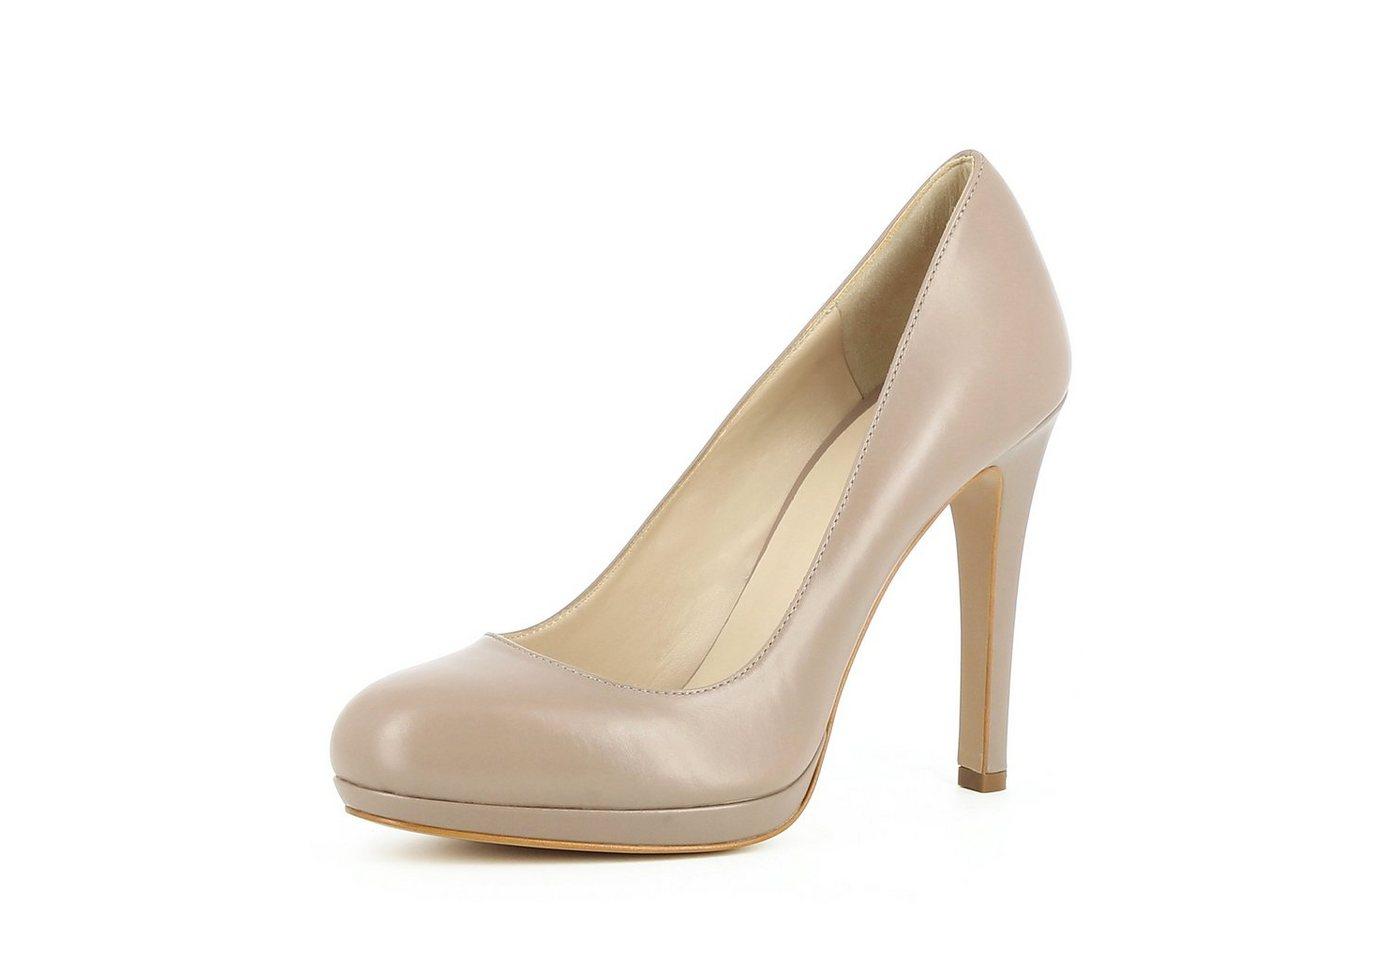 Evita »CRISTINA« Plateaupumps | Schuhe > Pumps > Plateaupumps | Evita